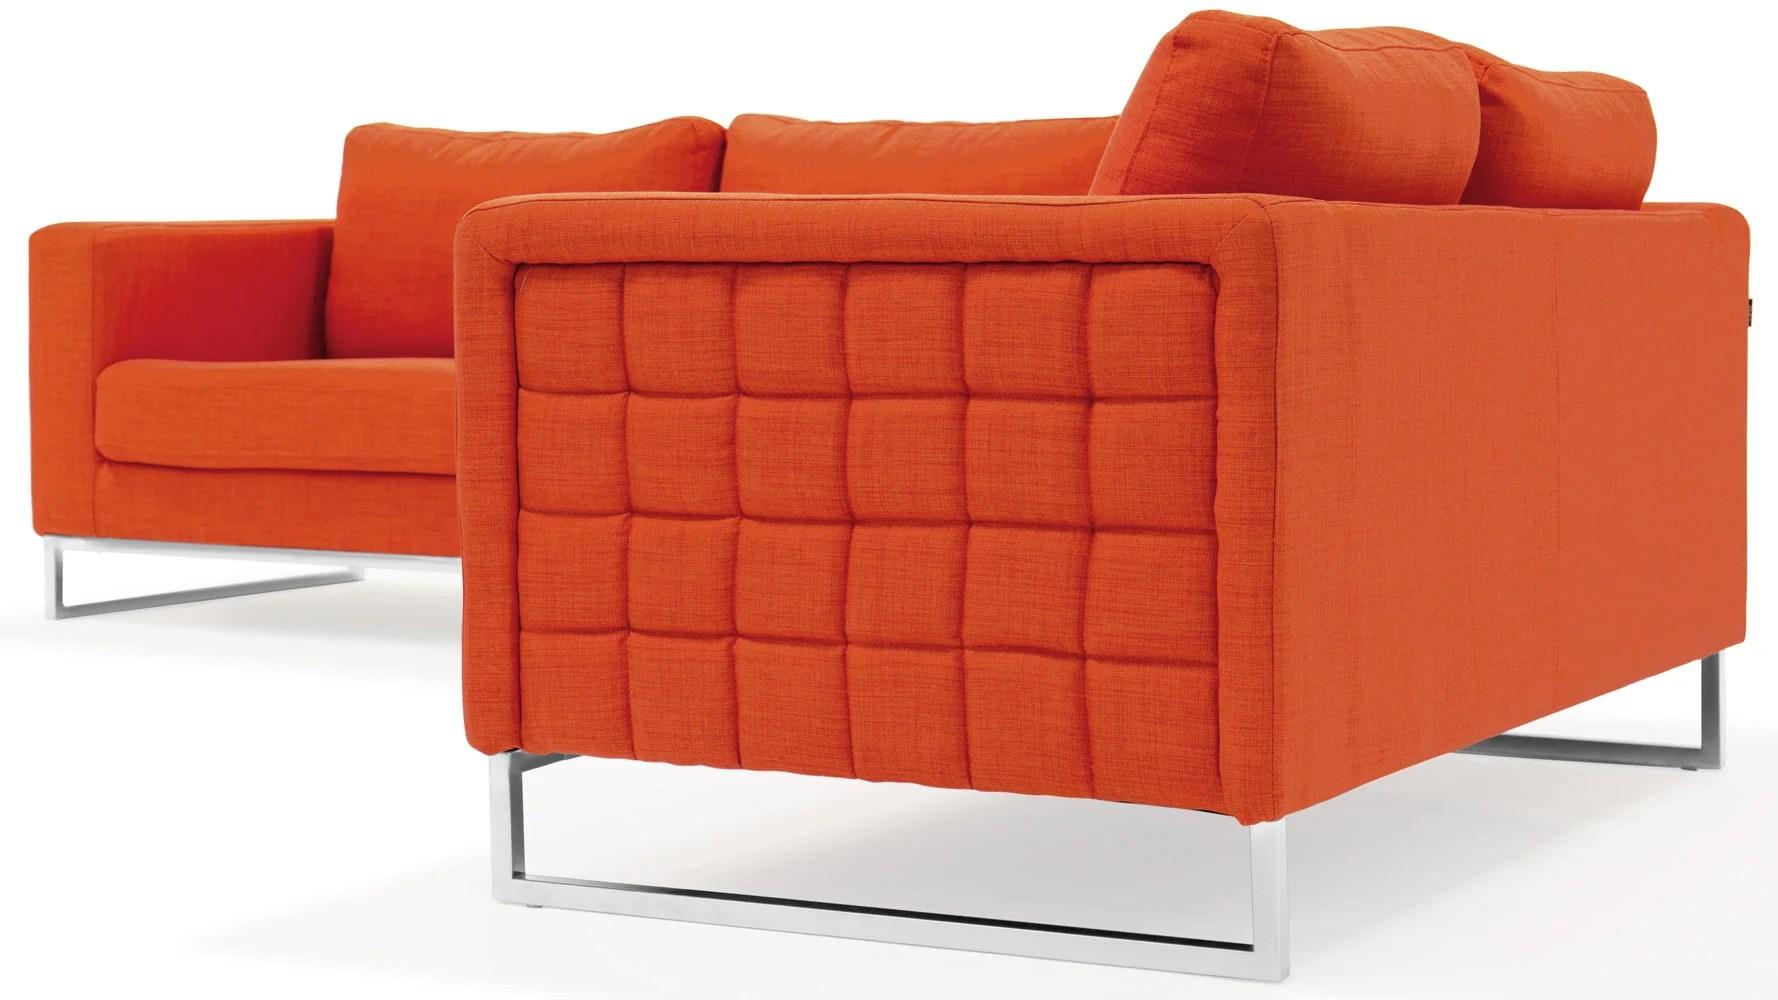 steel sofa set online chennai home decorators collection gordon modern orange fabric upholstered 2 piece with